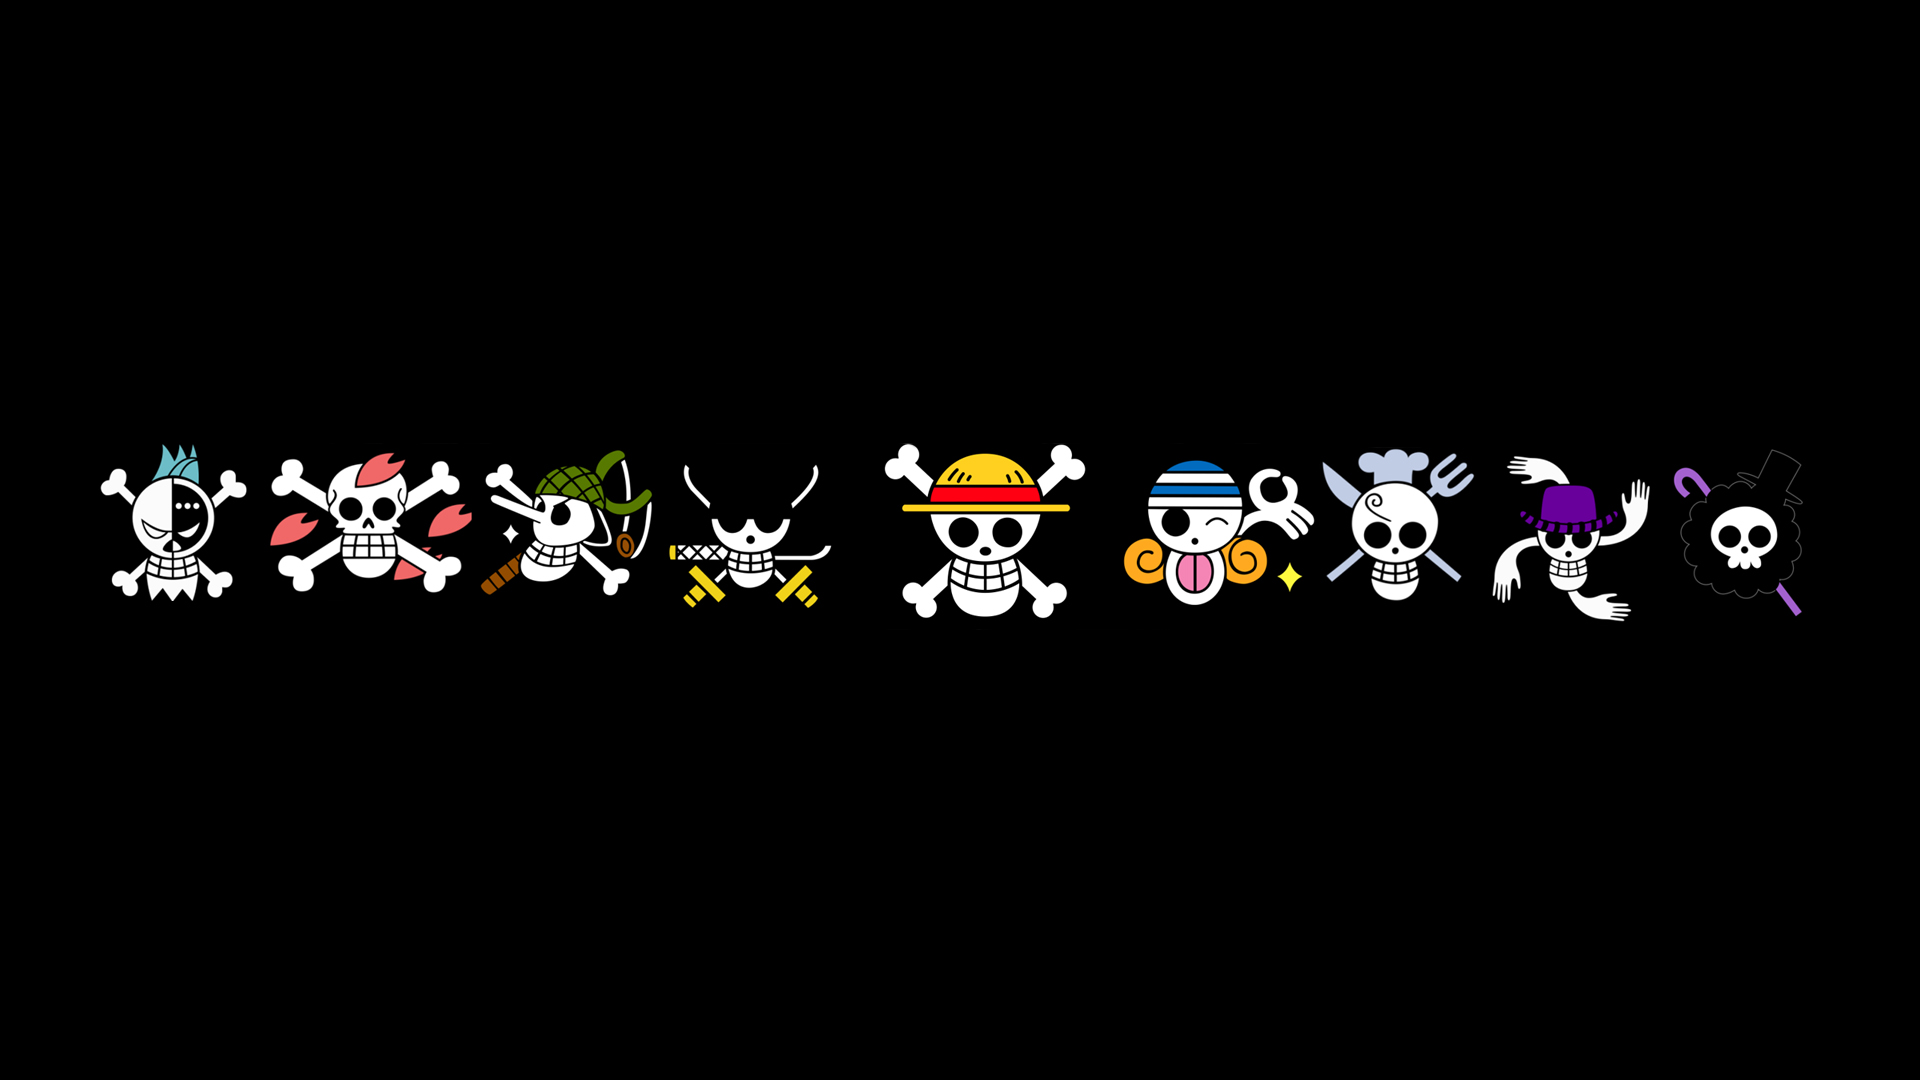 One Piece   Anime HD Wallpapers   Design Hey Design Hey   Creative 1920x1080